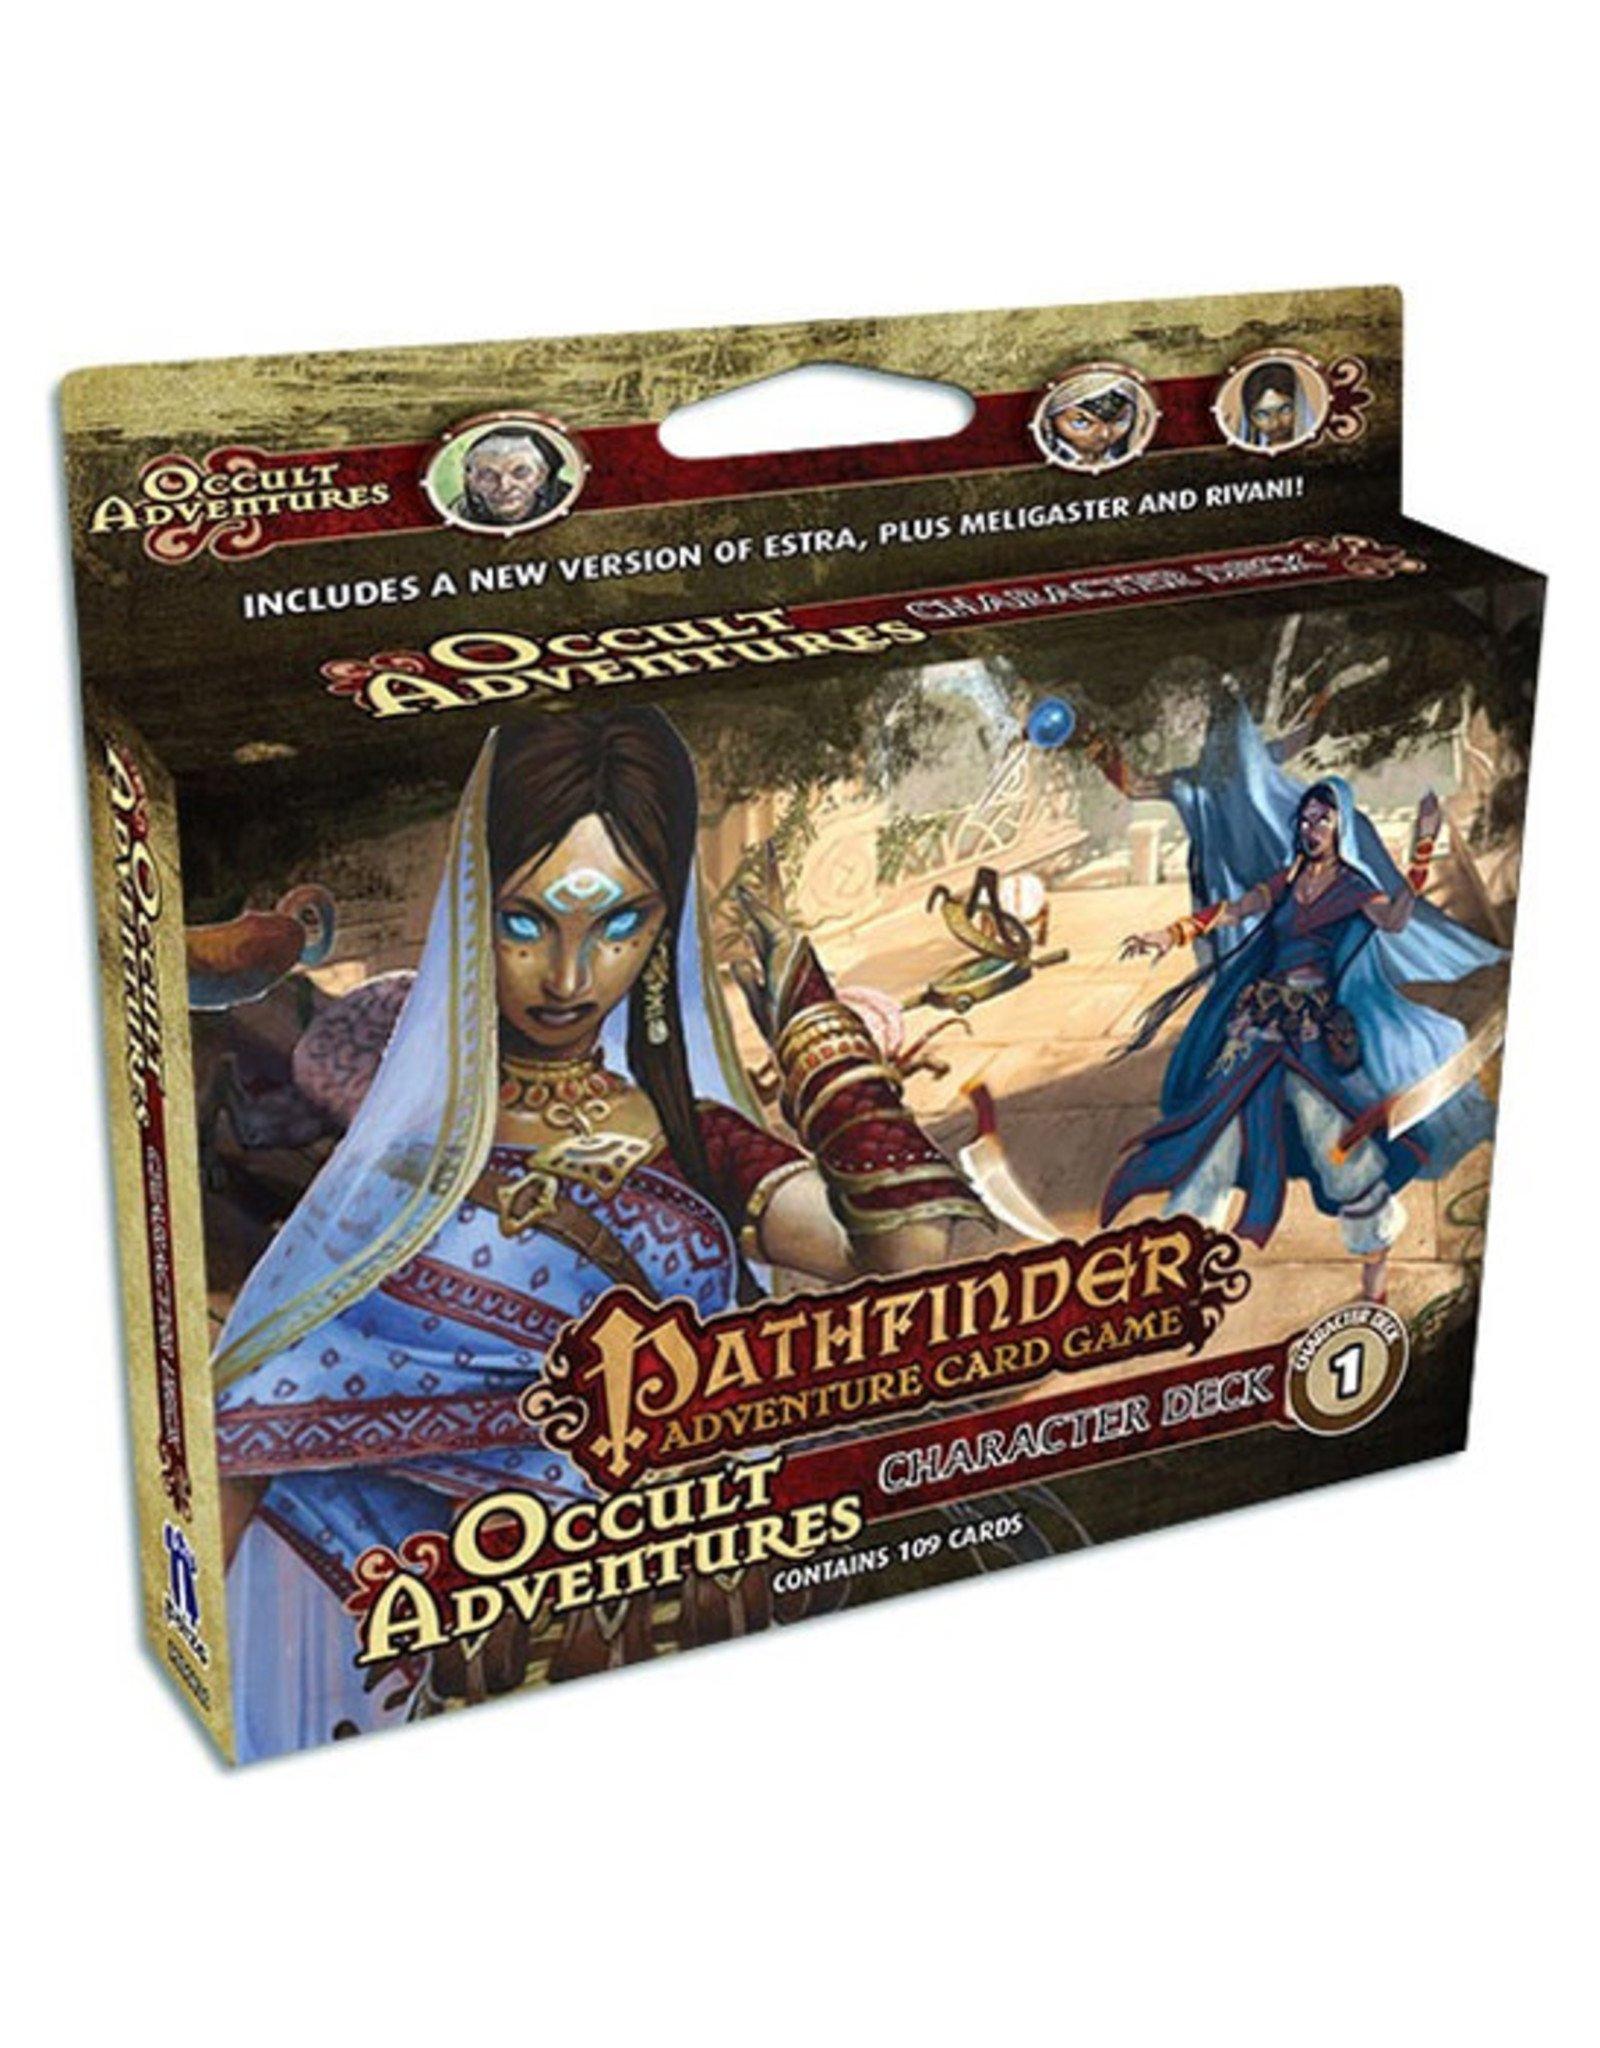 Pathfinder Pathfinder: Adventure Card Game - Occult Adventures - Character Deck 1